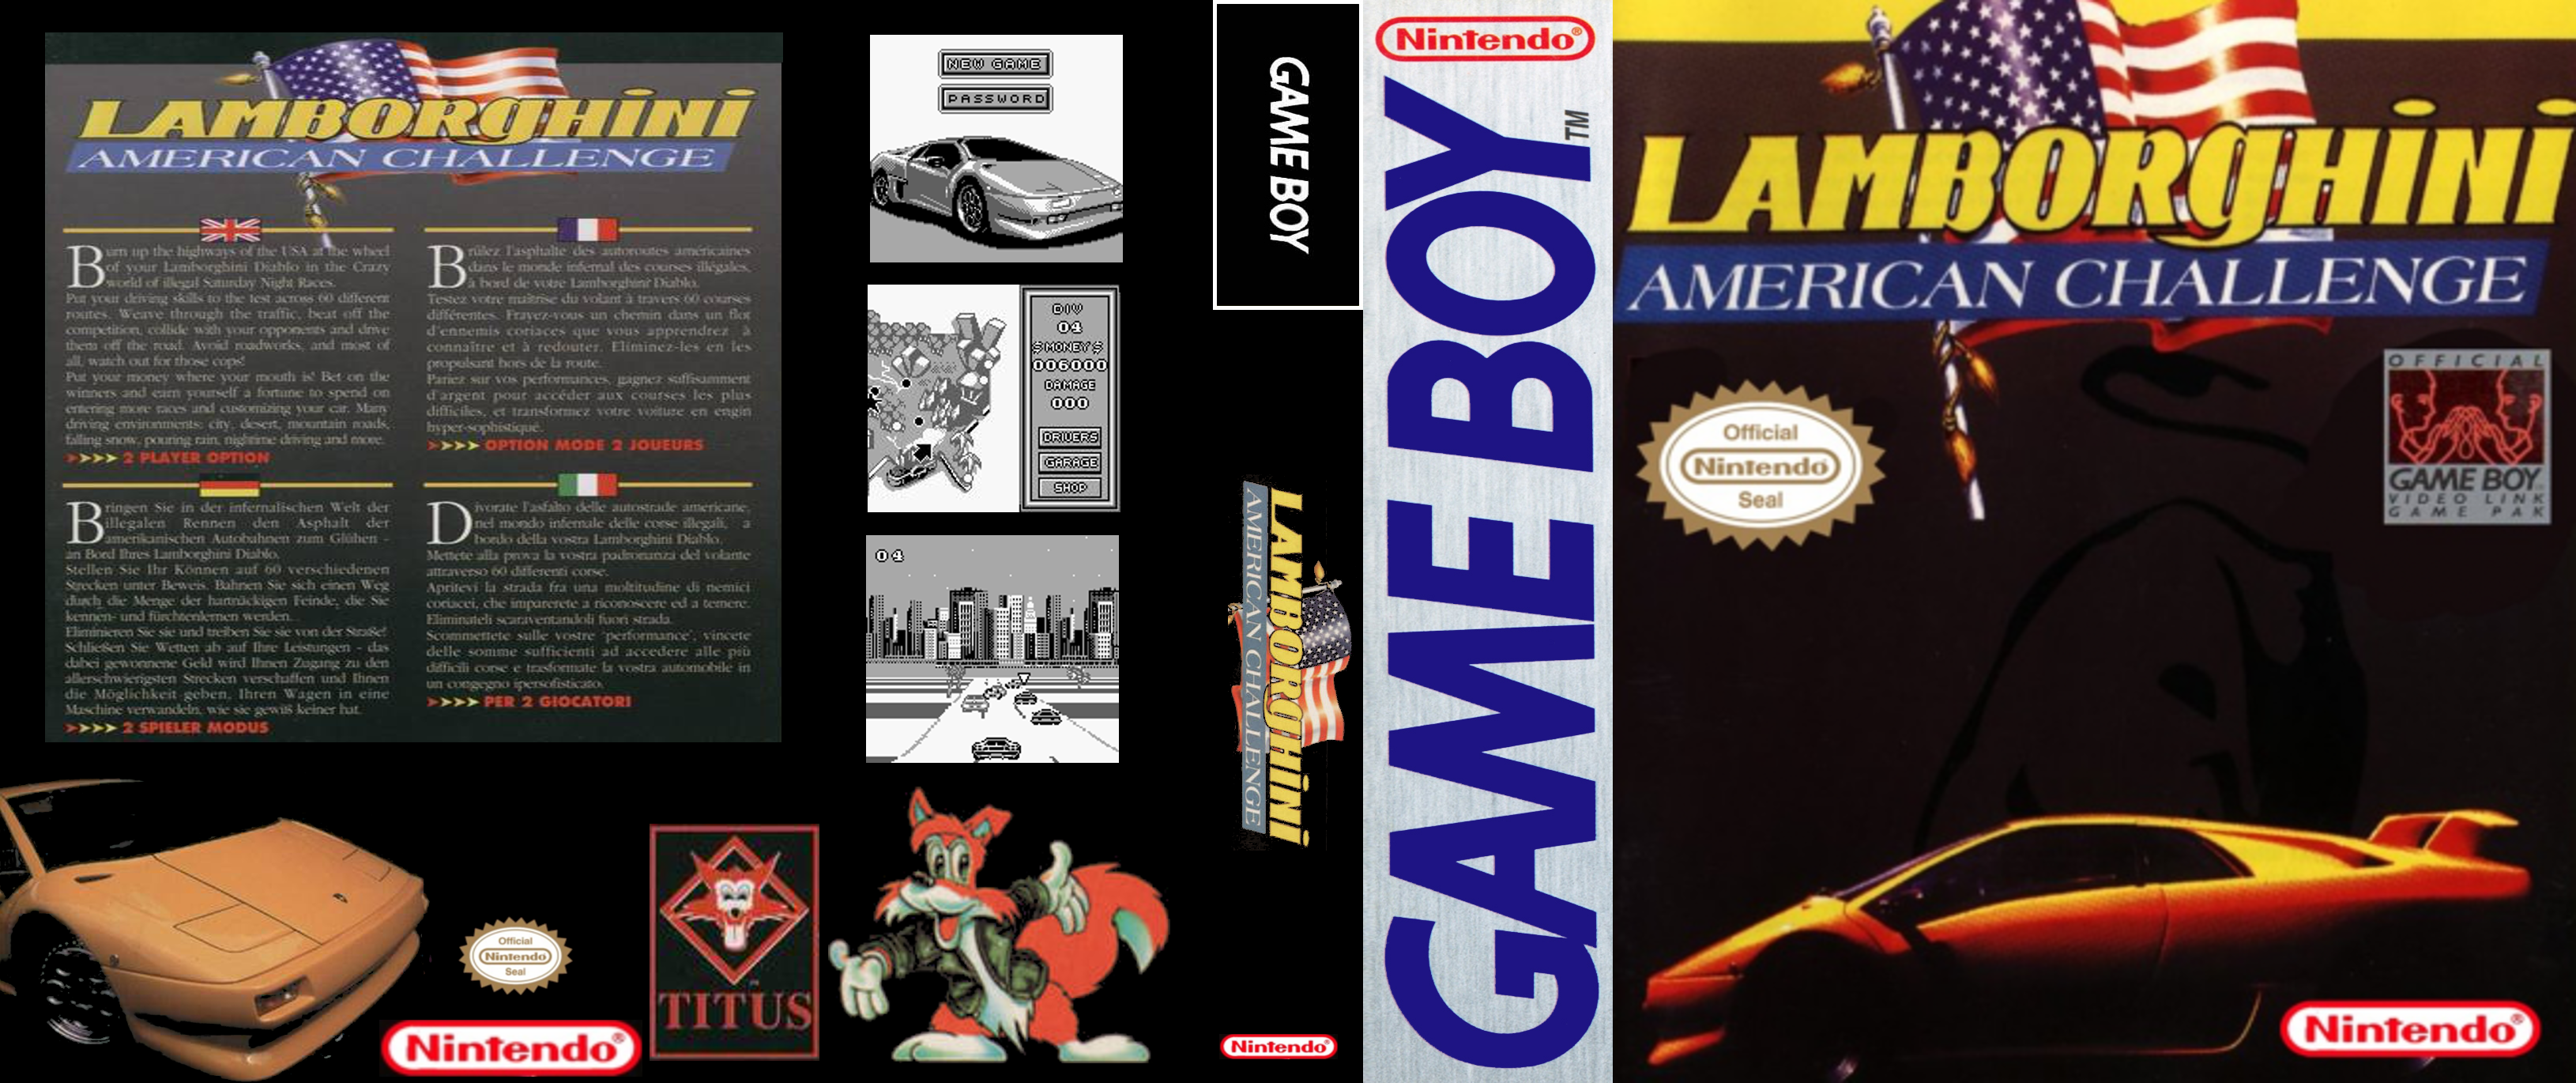 Lamborghini American Challenge Gameboy : cover ! un autre challenge ;) Lamborghini-challenge-gb